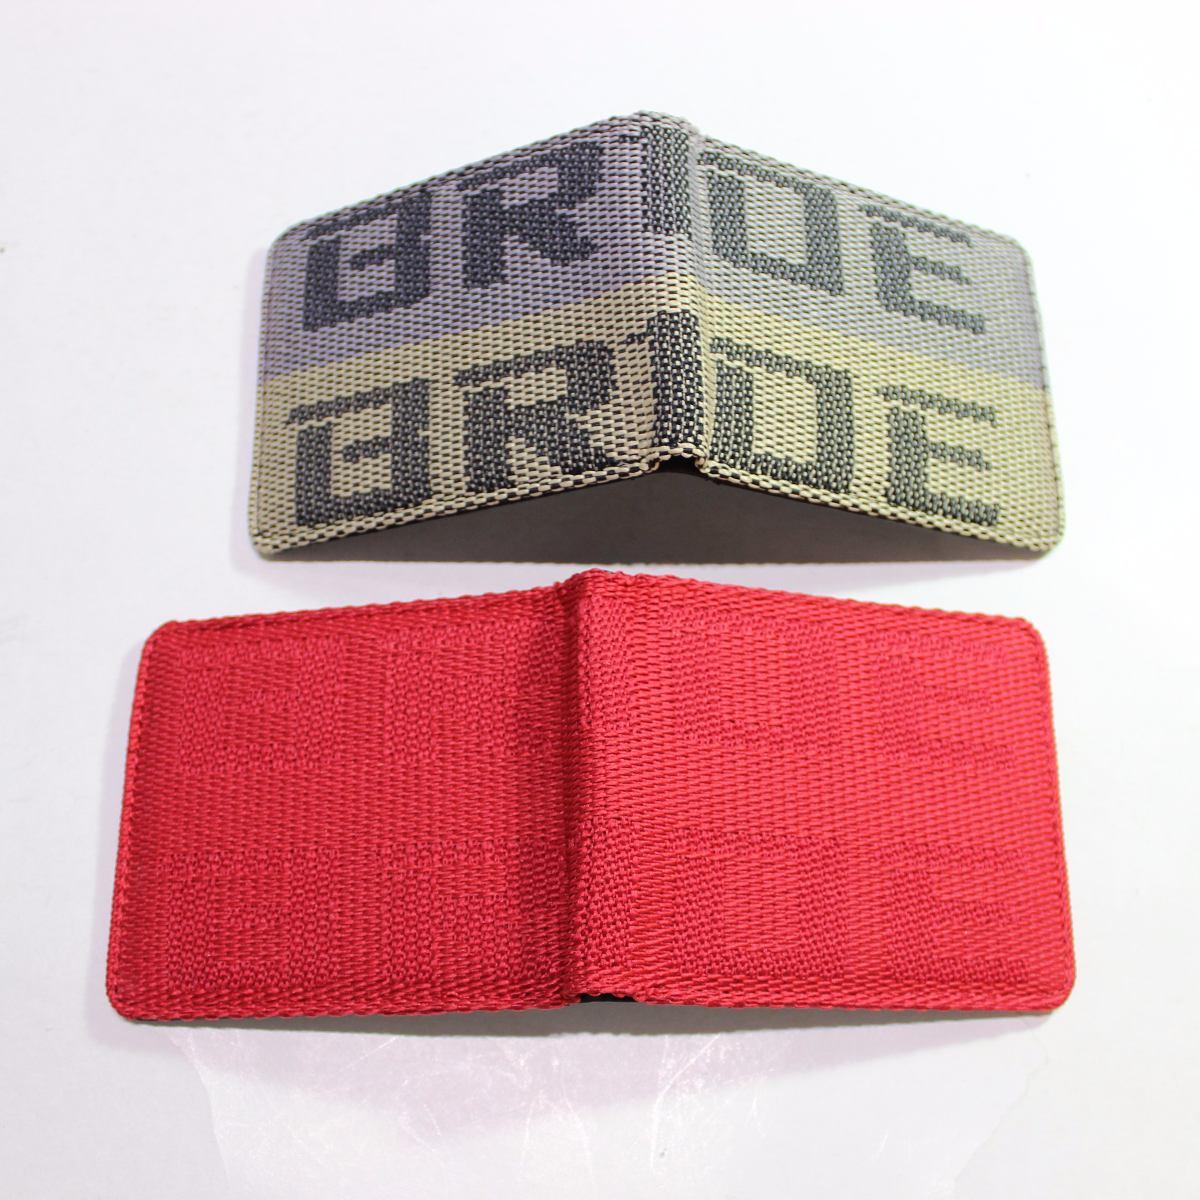 b2448fd1c Jdm Honda Carteras Bride Jdm Honda Takata Hombre Vw - $ 678.00 en ...